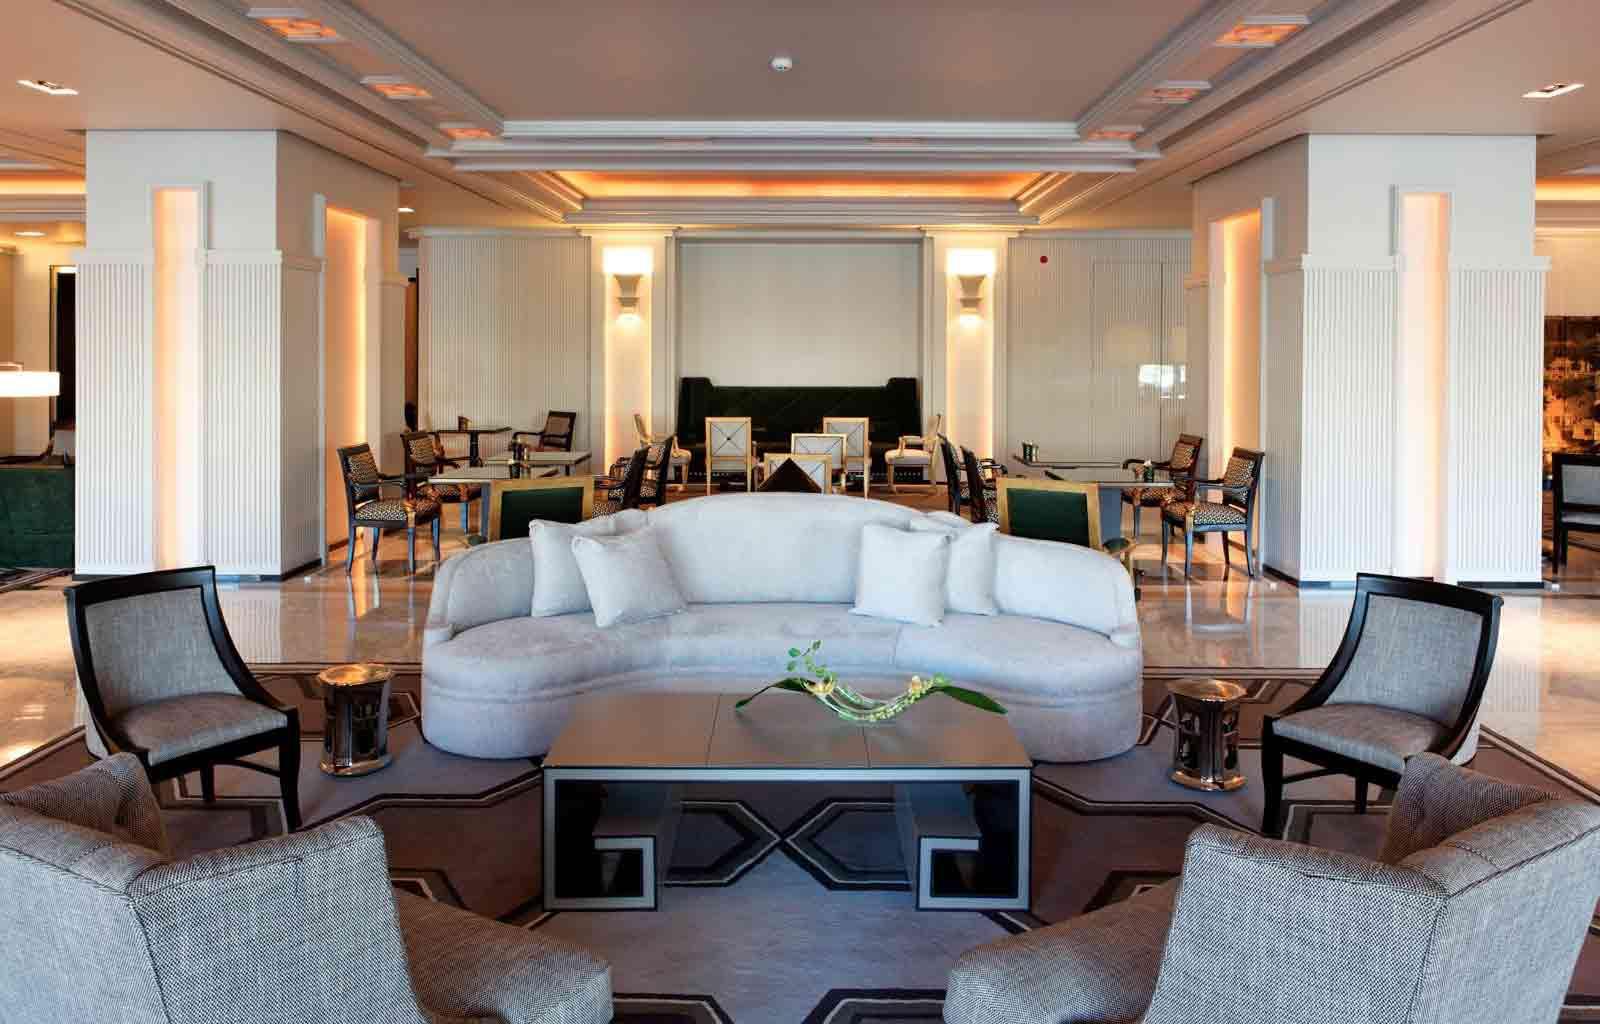 Villa magna madrid spain out there magazine luxury - Villamagna hotel madrid ...